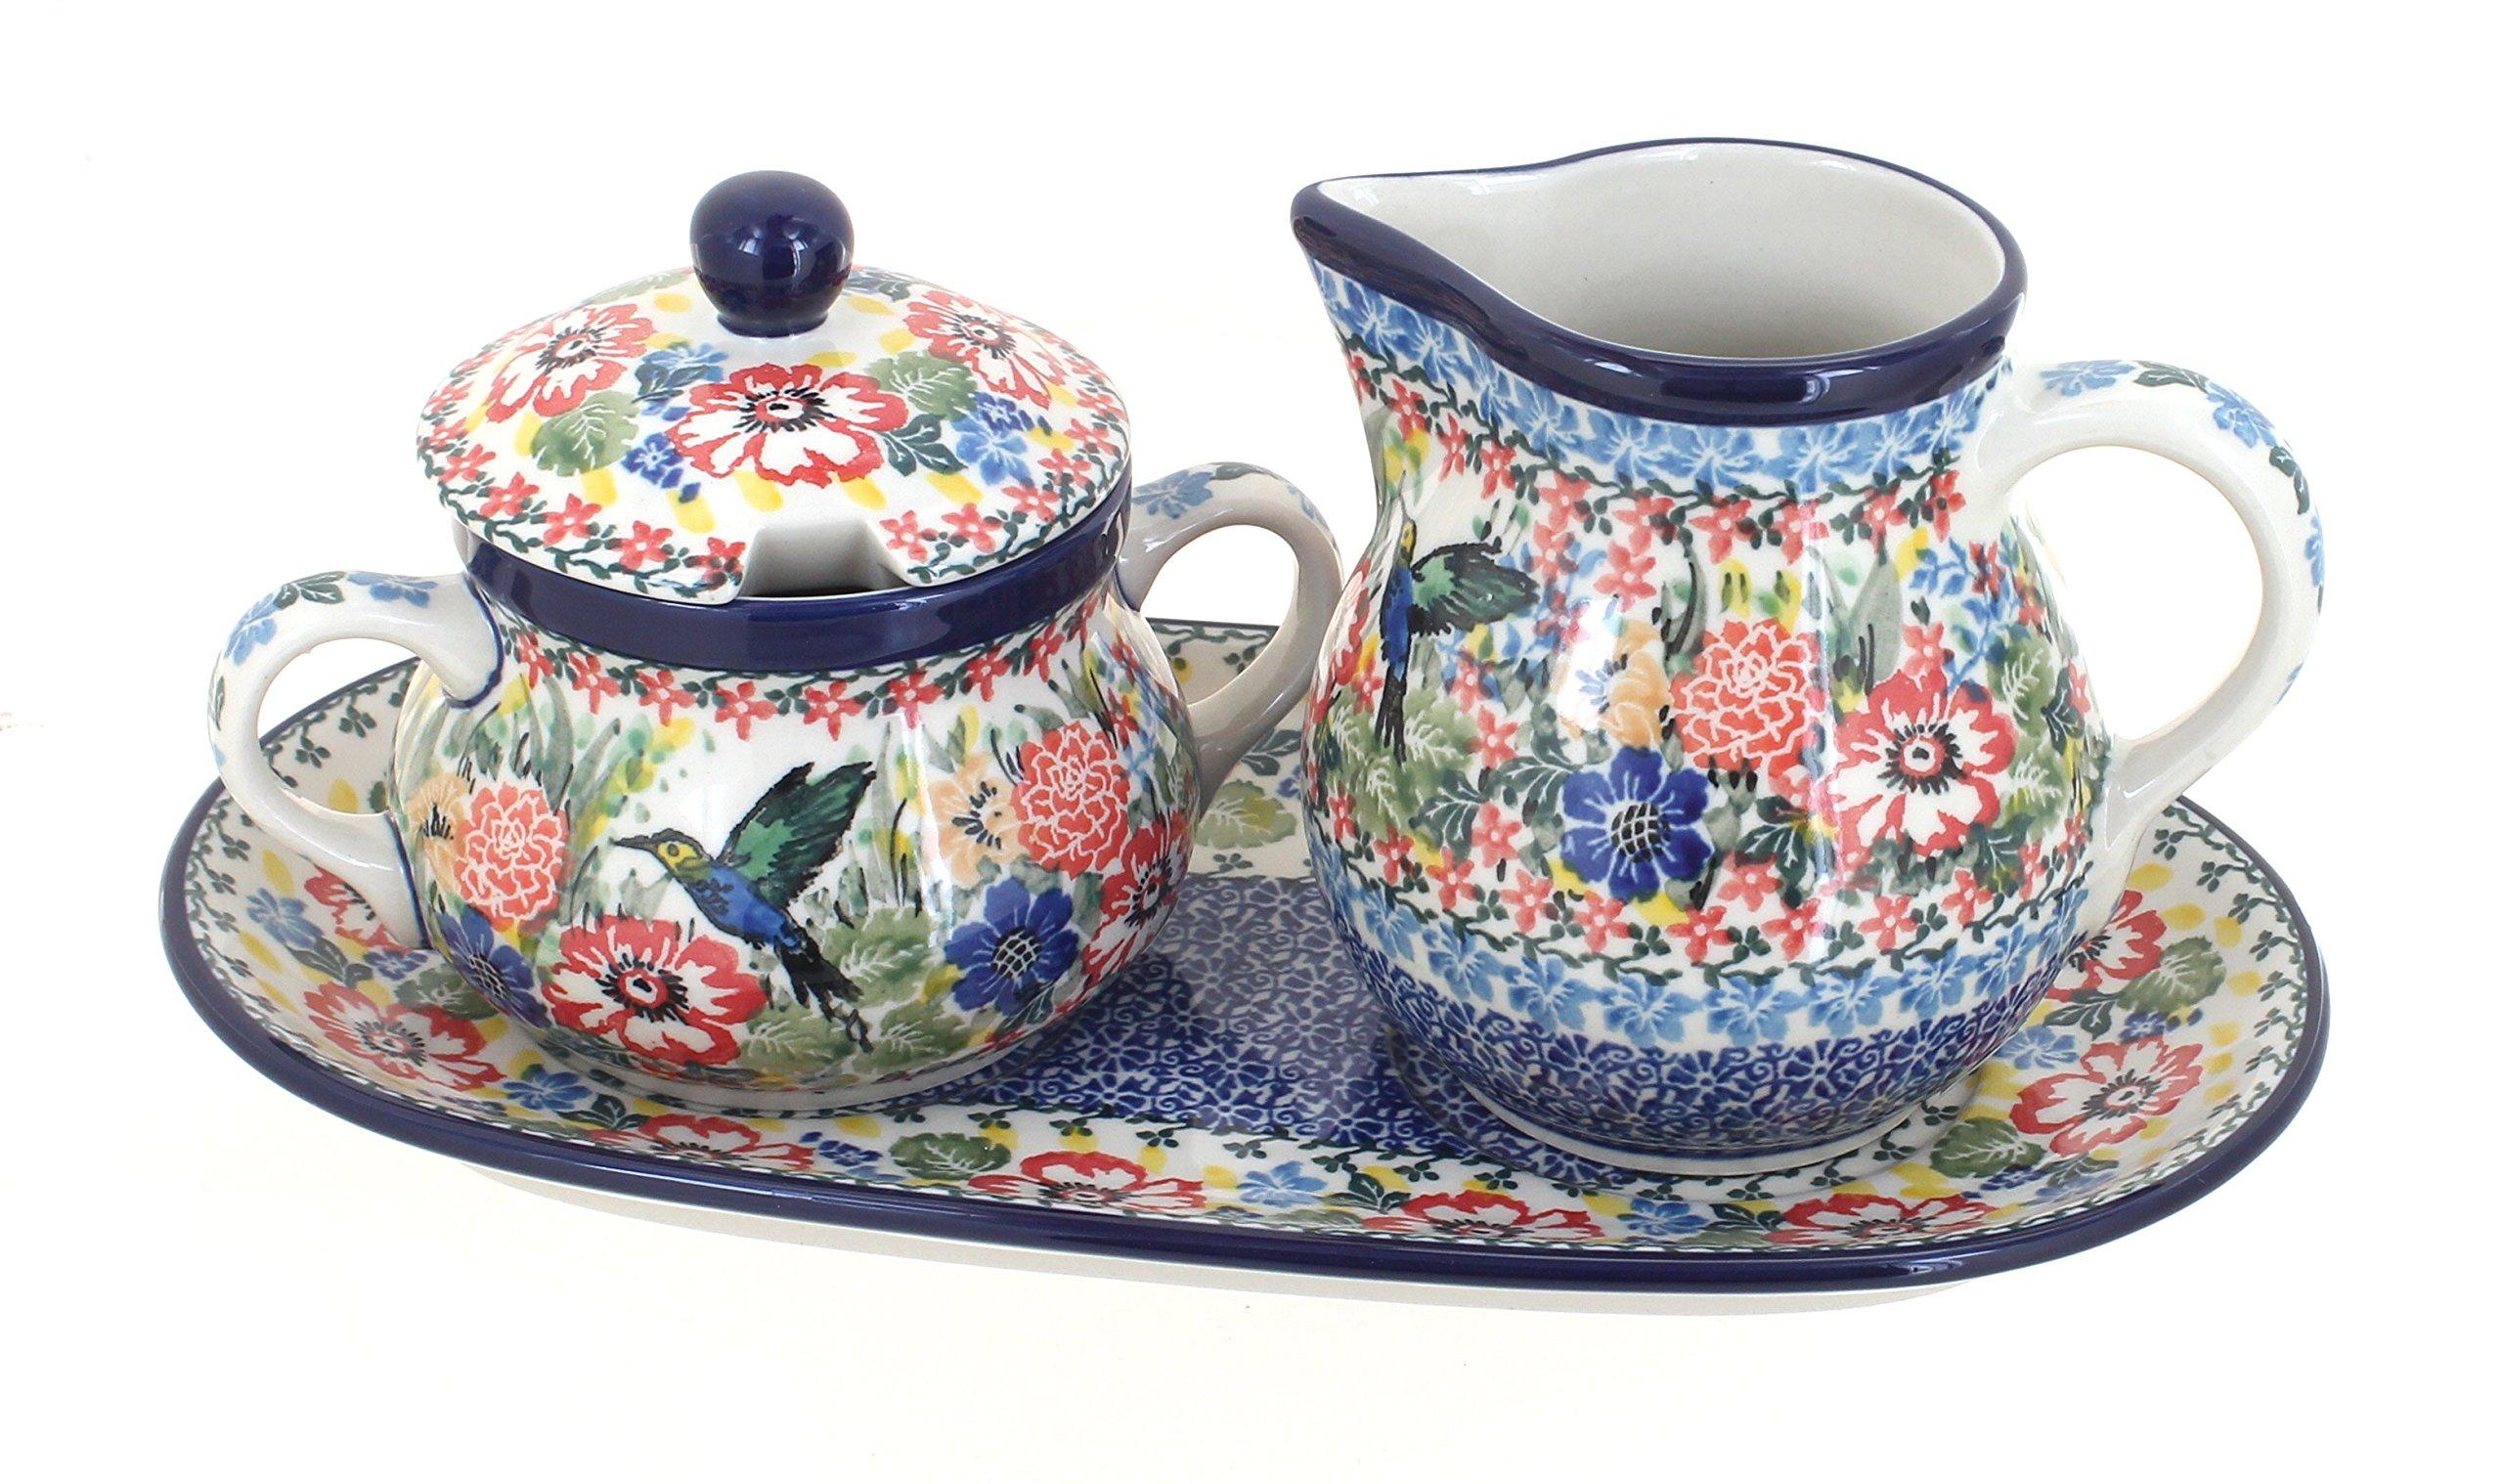 Polish Pottery Hummingbird Cream & Sugar Set with Tray